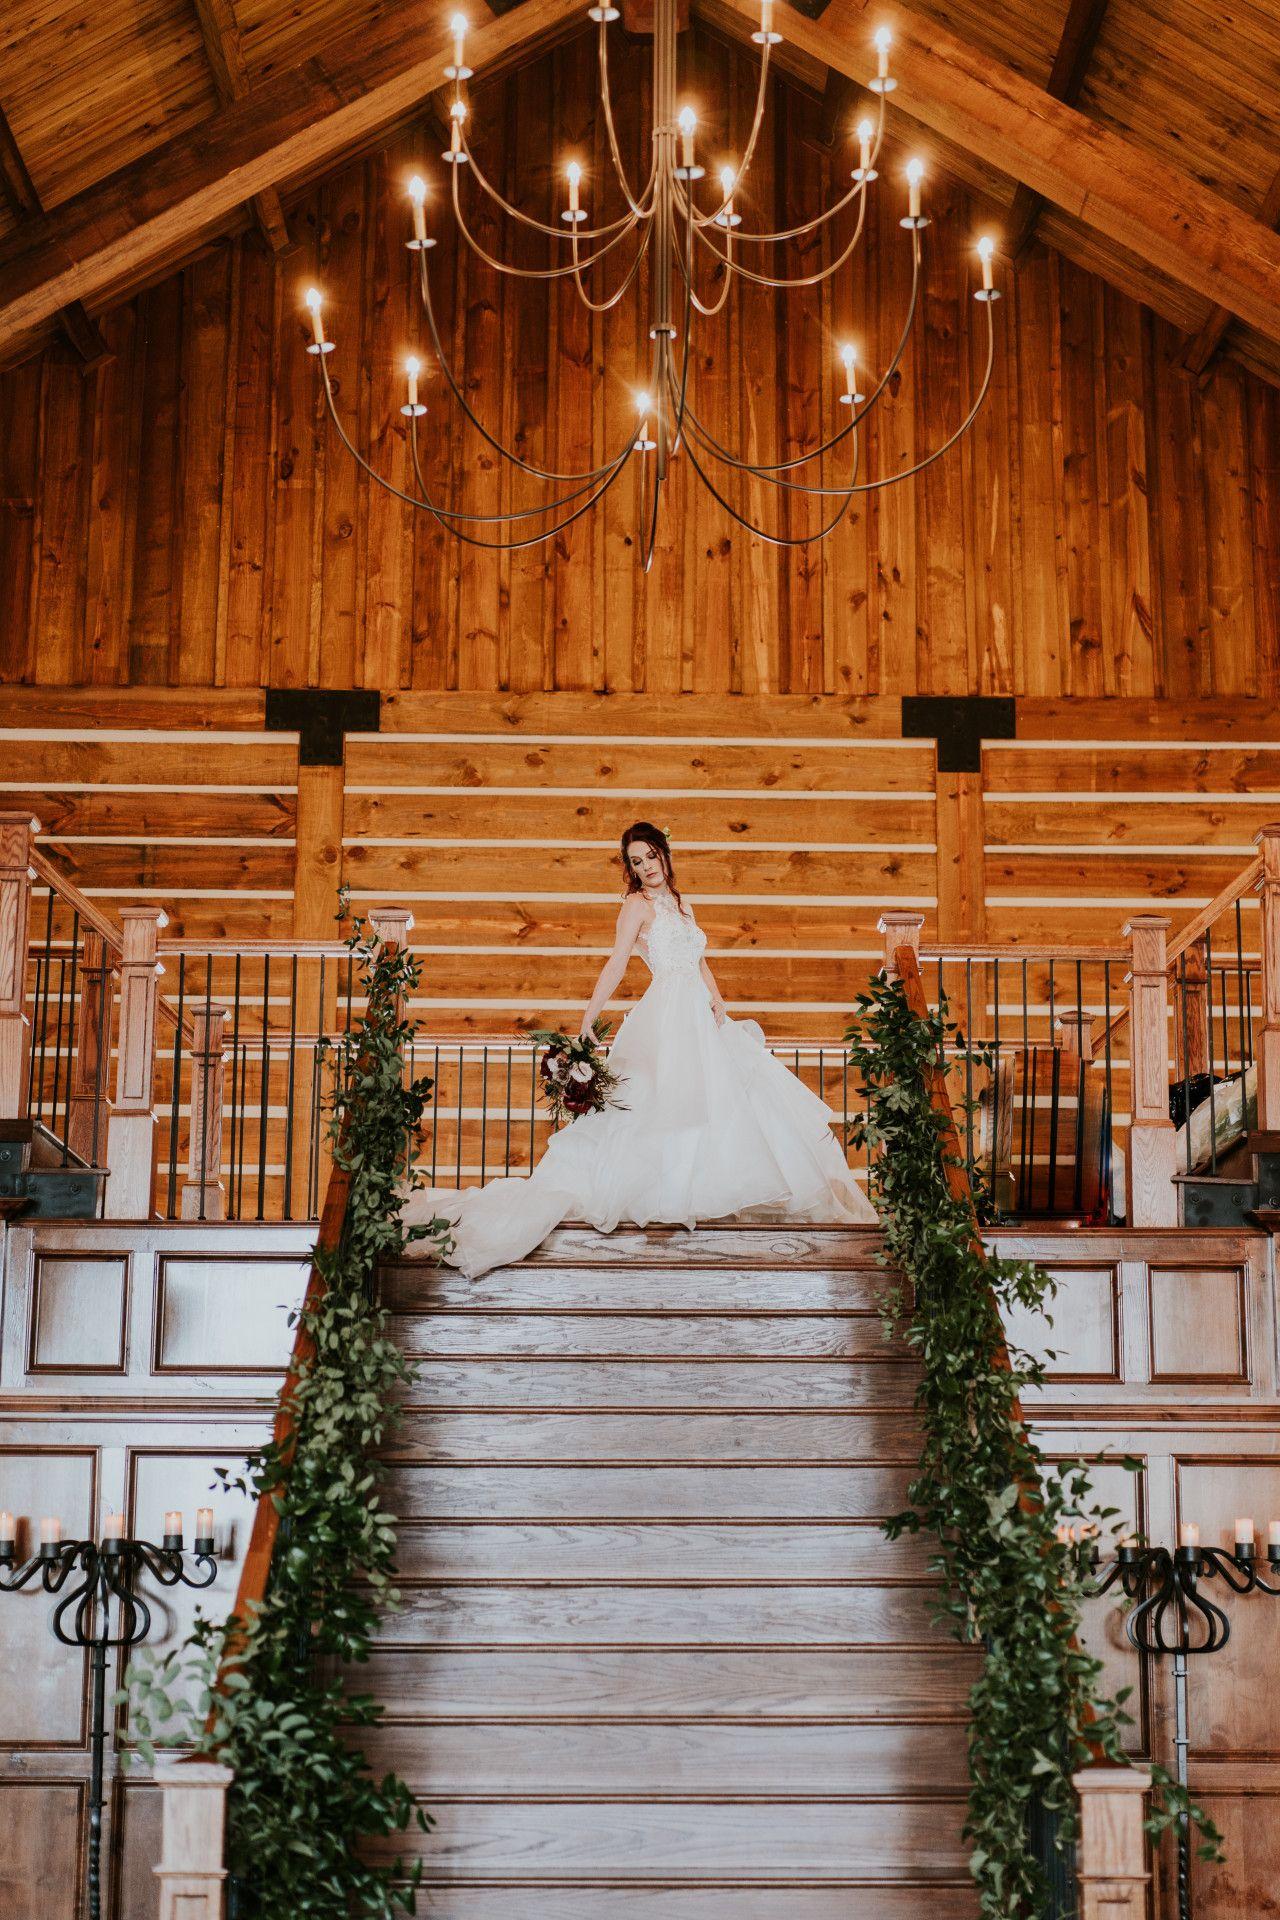 Best Dallas Wedding Venues Best Dfw Wedding Venues Lodge Wedding Venue Near Dallas Texa Dallas Wedding Venues Wedding Venue Locations Dfw Wedding Venues